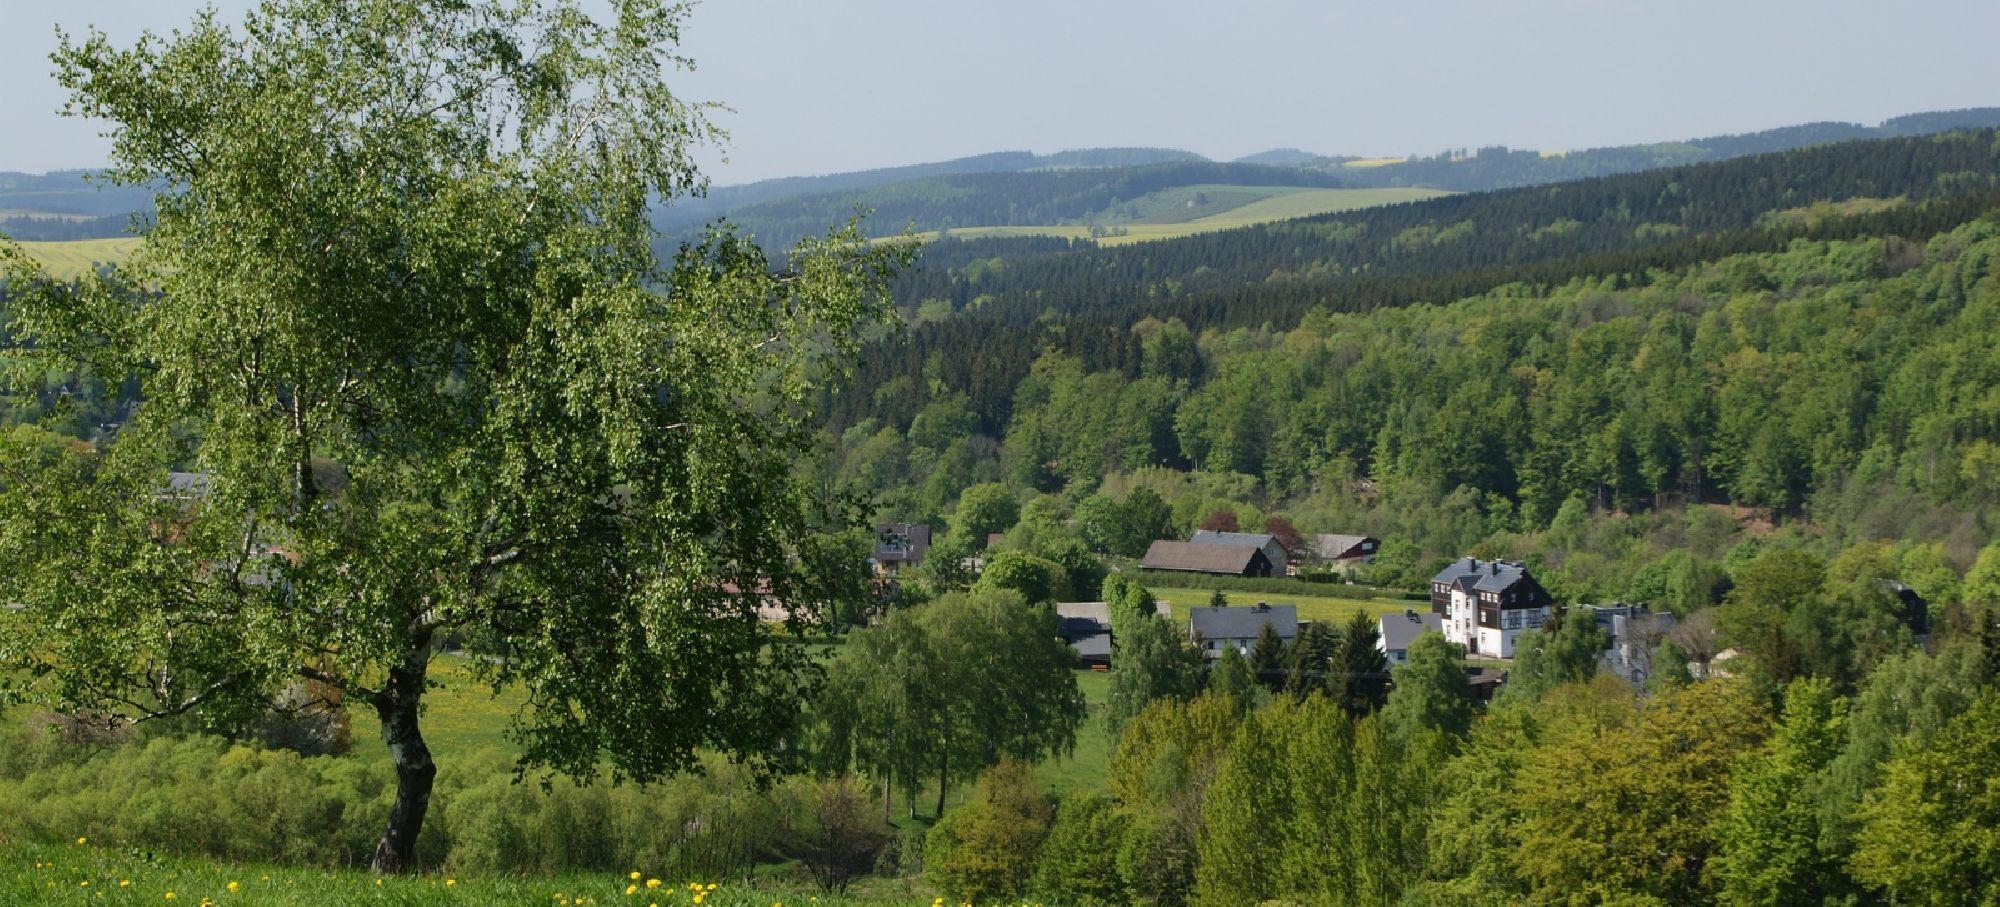 Neuclausnitz im Erzgebirge